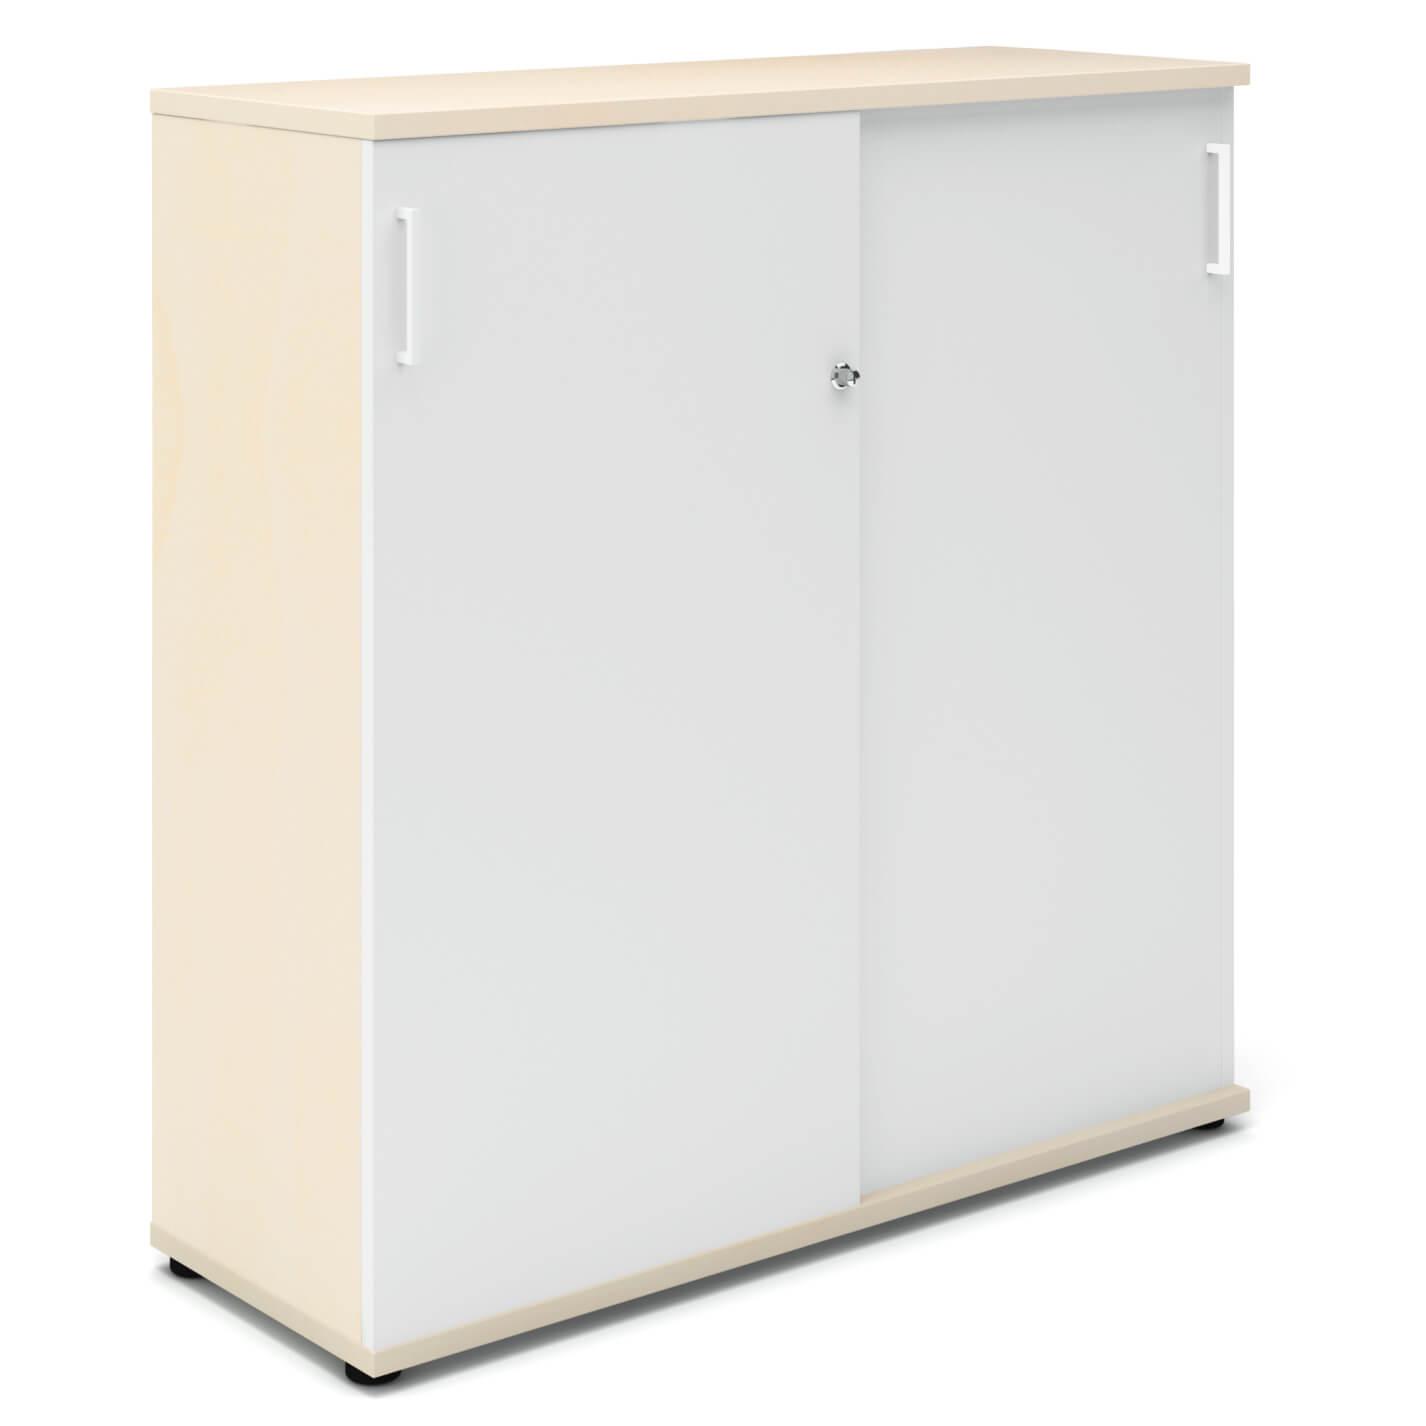 UNI Aktenschrank 1,2M abschließbar 3OH Weiß-Ahorn Büroschrank Schiebetürenschrank